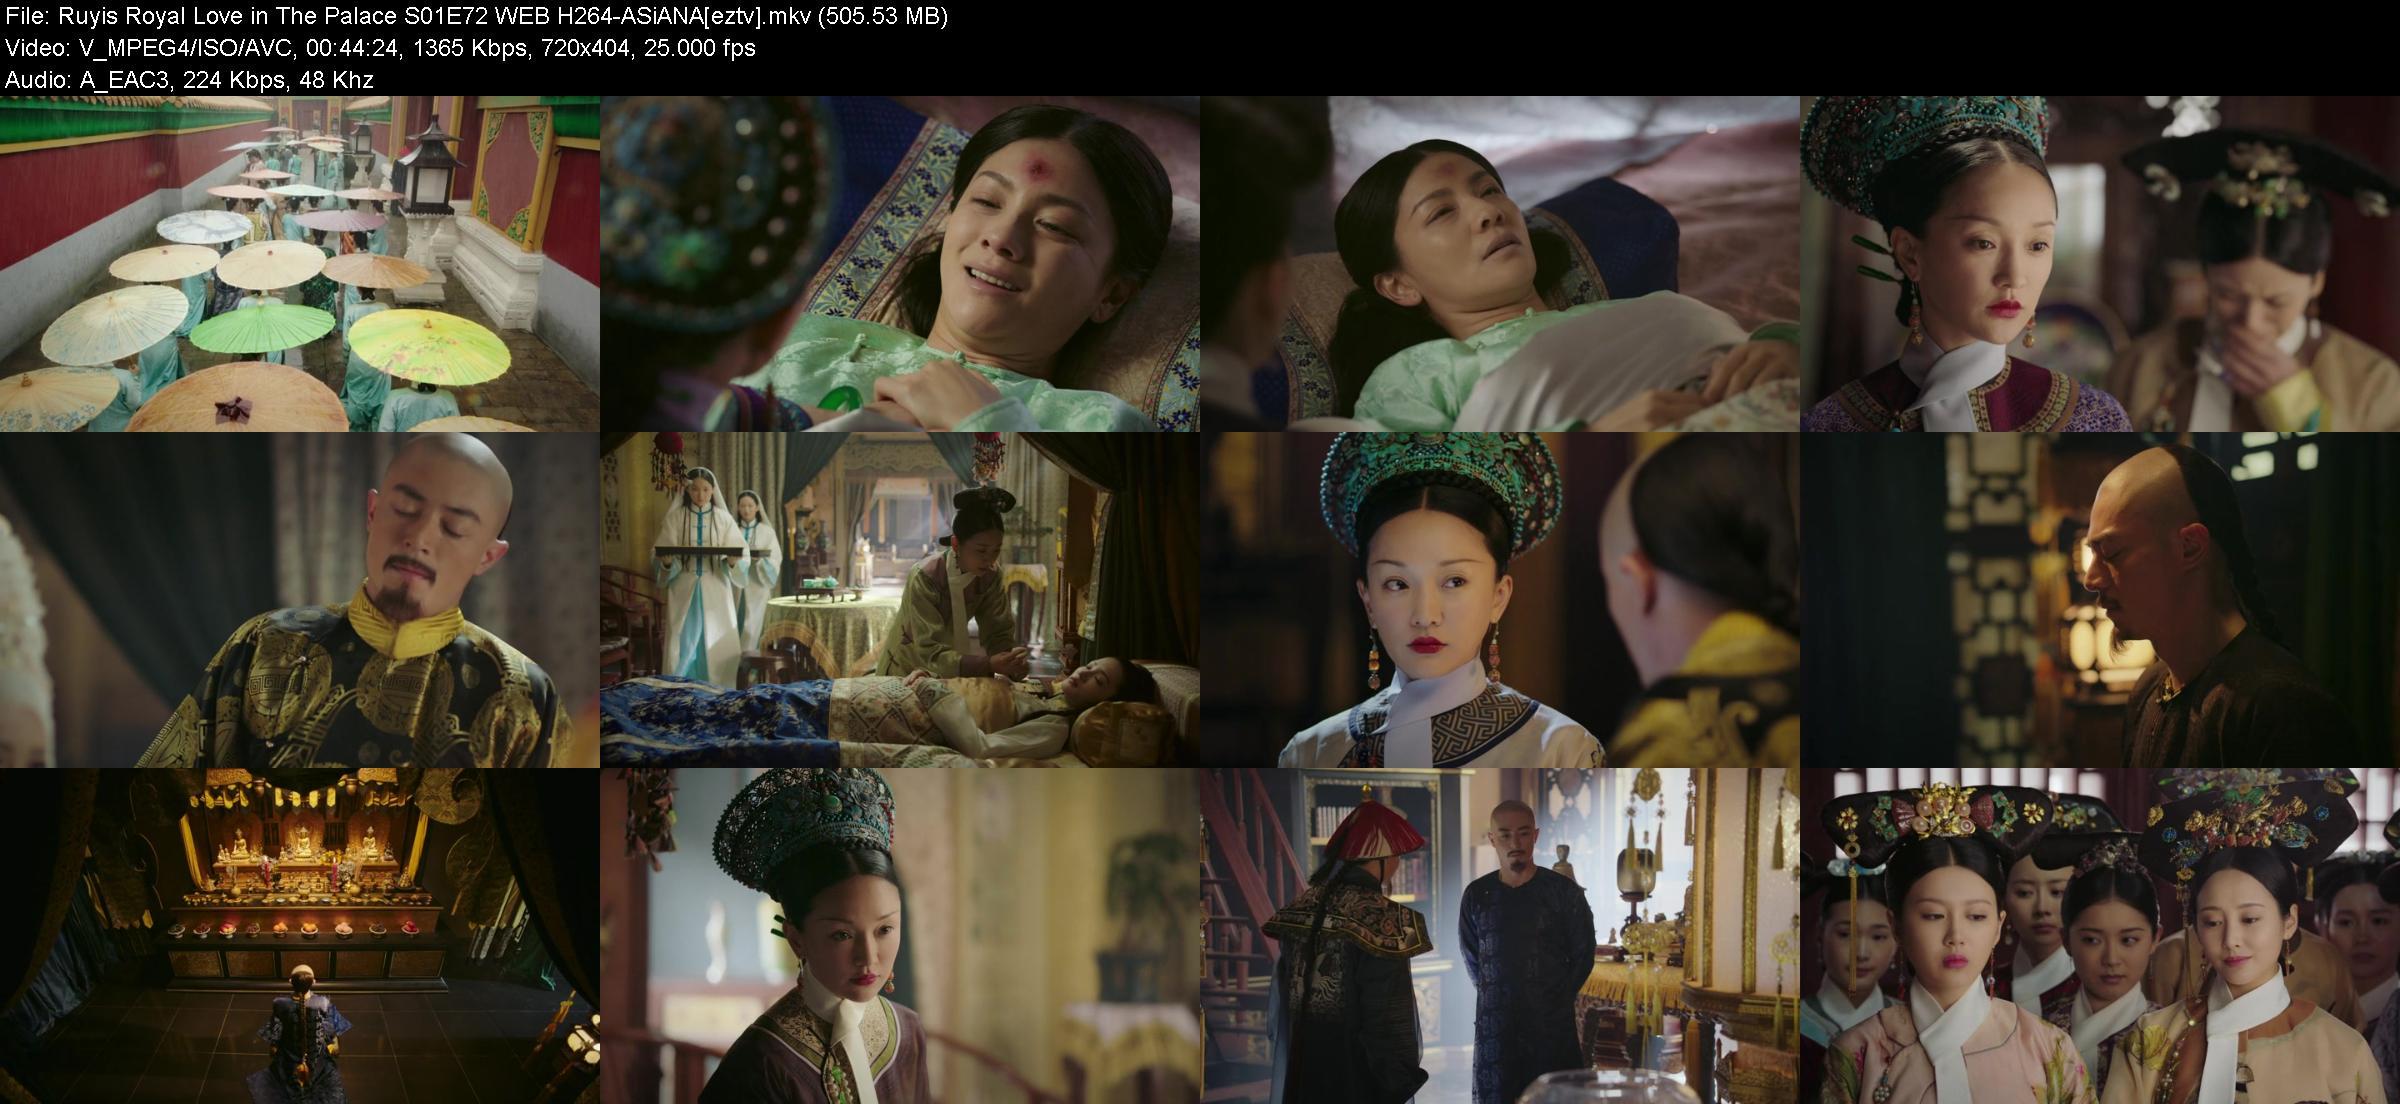 Ruyis Royal Love in The Palace S01E72 WEB H264 ASiANA